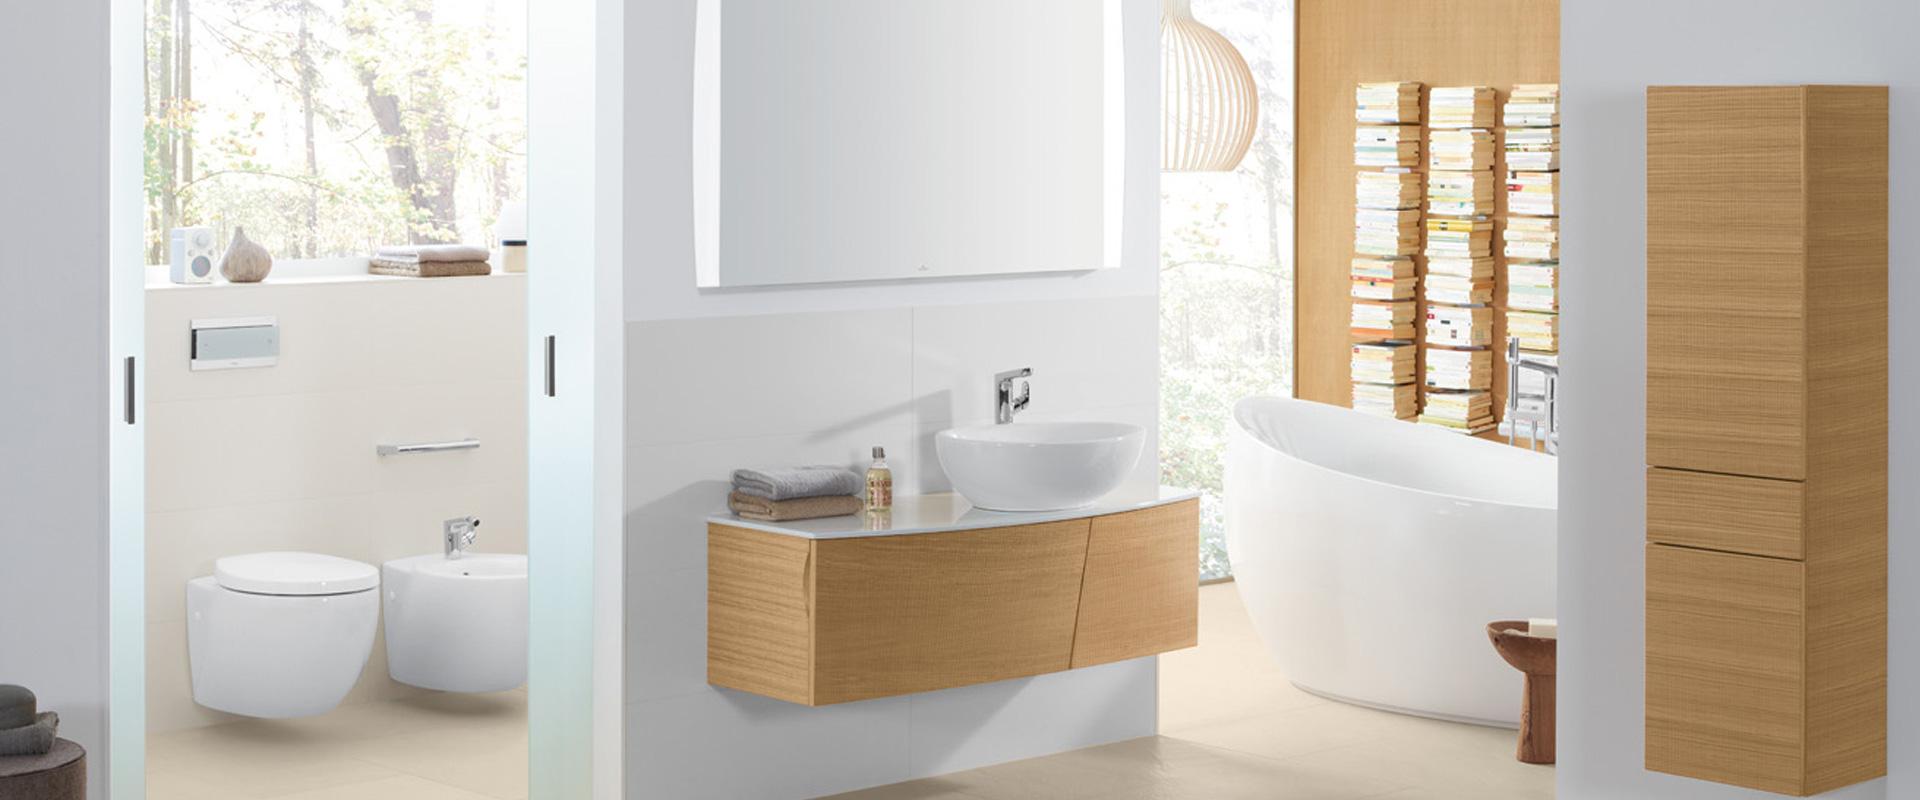 Ceramics - Care tips for your bathroom items - Villeroy & Boch